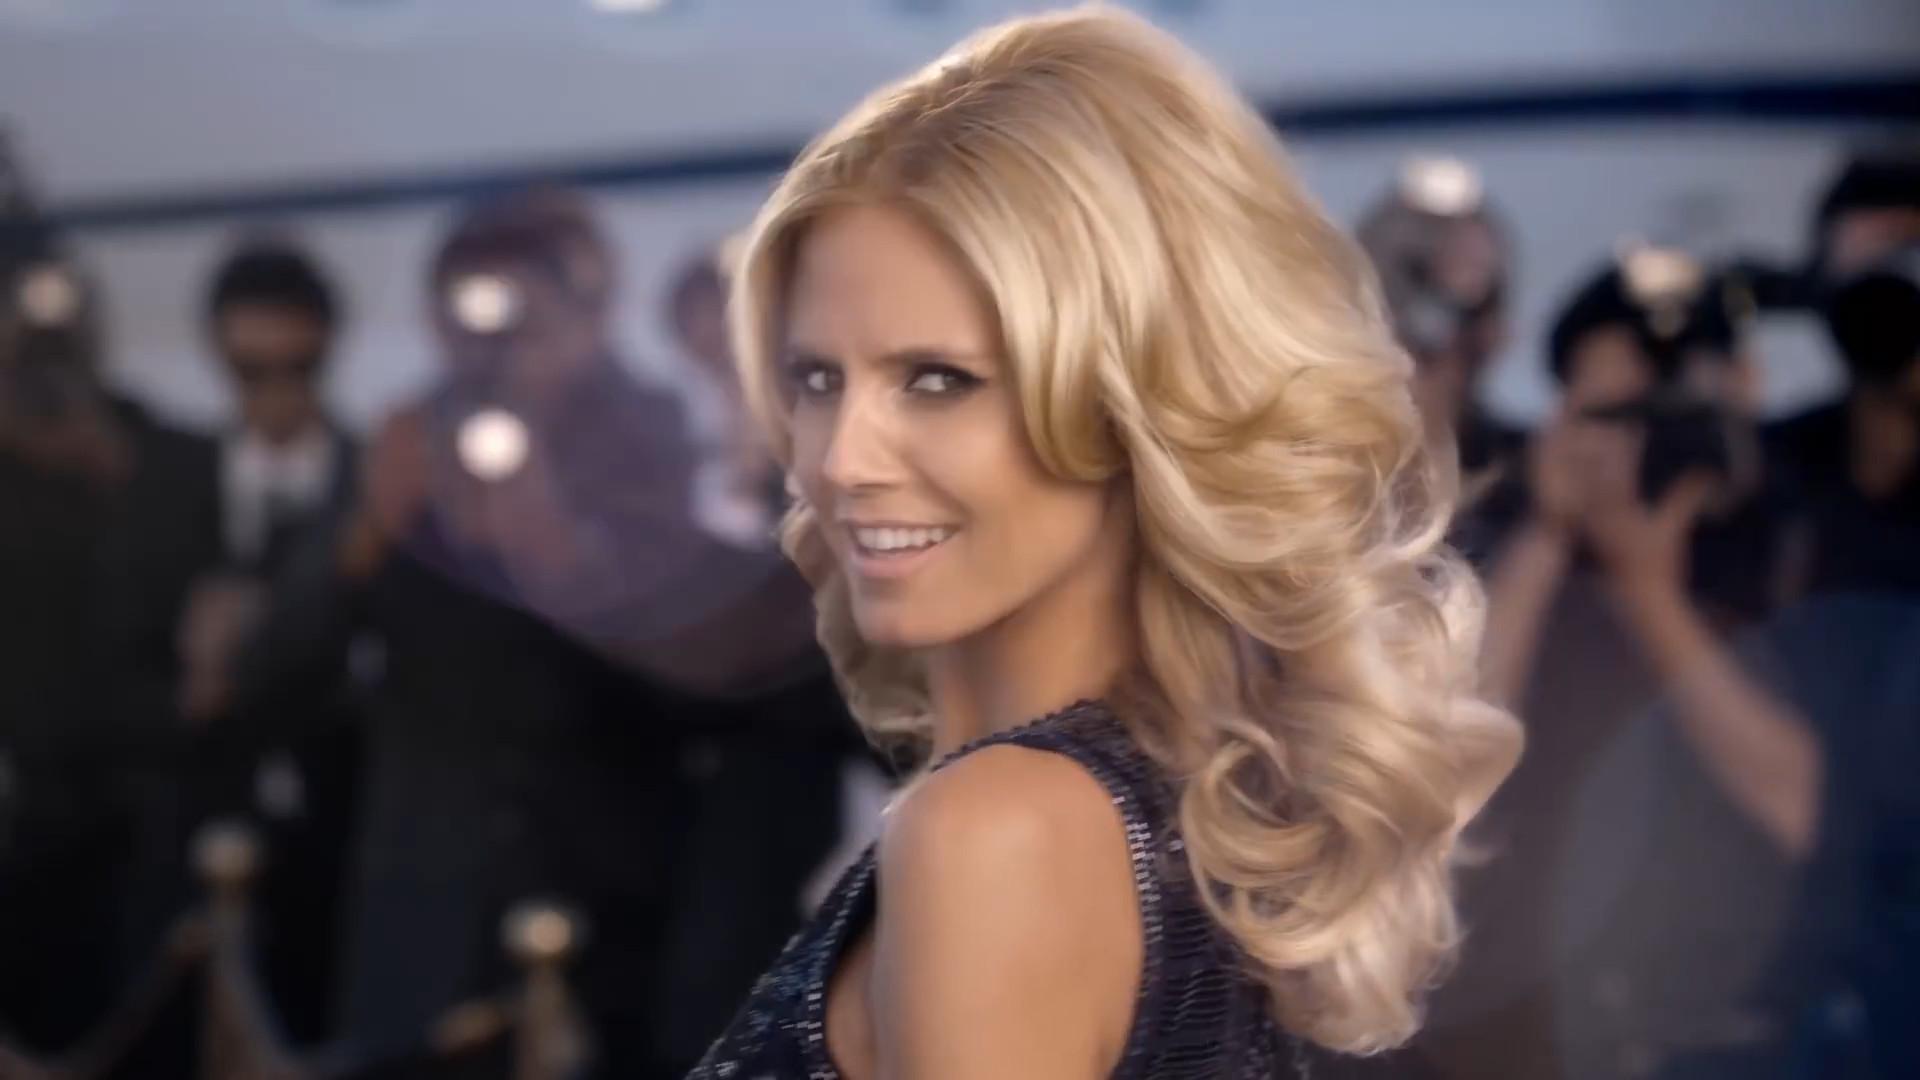 Closeup of Heidi Klumm smiling and showing her wonderfull blond hair in her Schwarzkopf Drei Wetter Taft Ultimate commercial.